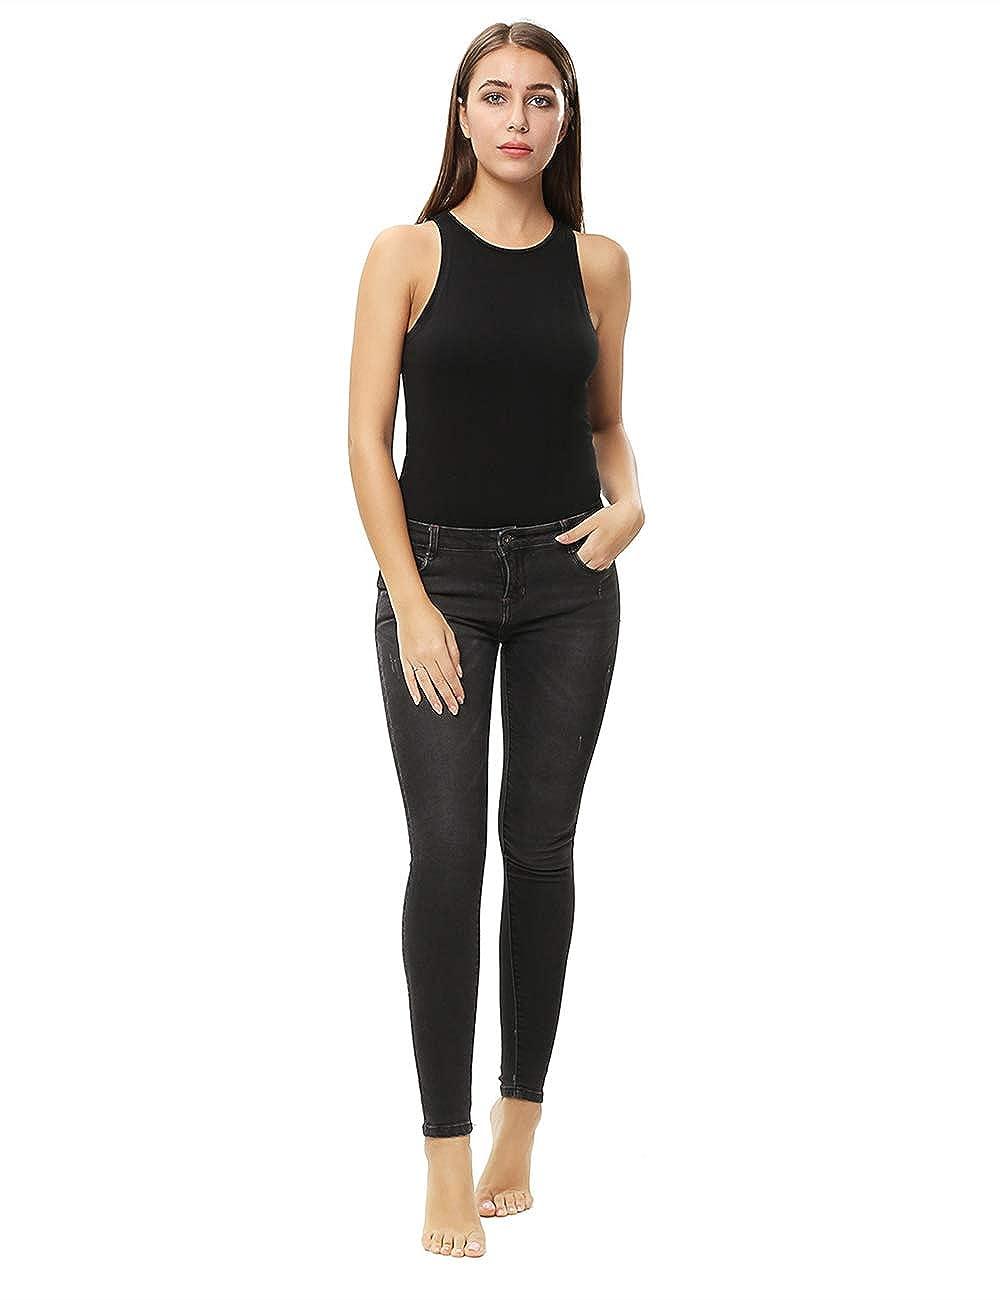 c3dc6bc74f68 Amazon.com: ENIDMIL Women's Tank Top High Neck Sleeveless Bodysuit Jumpsuits:  Clothing